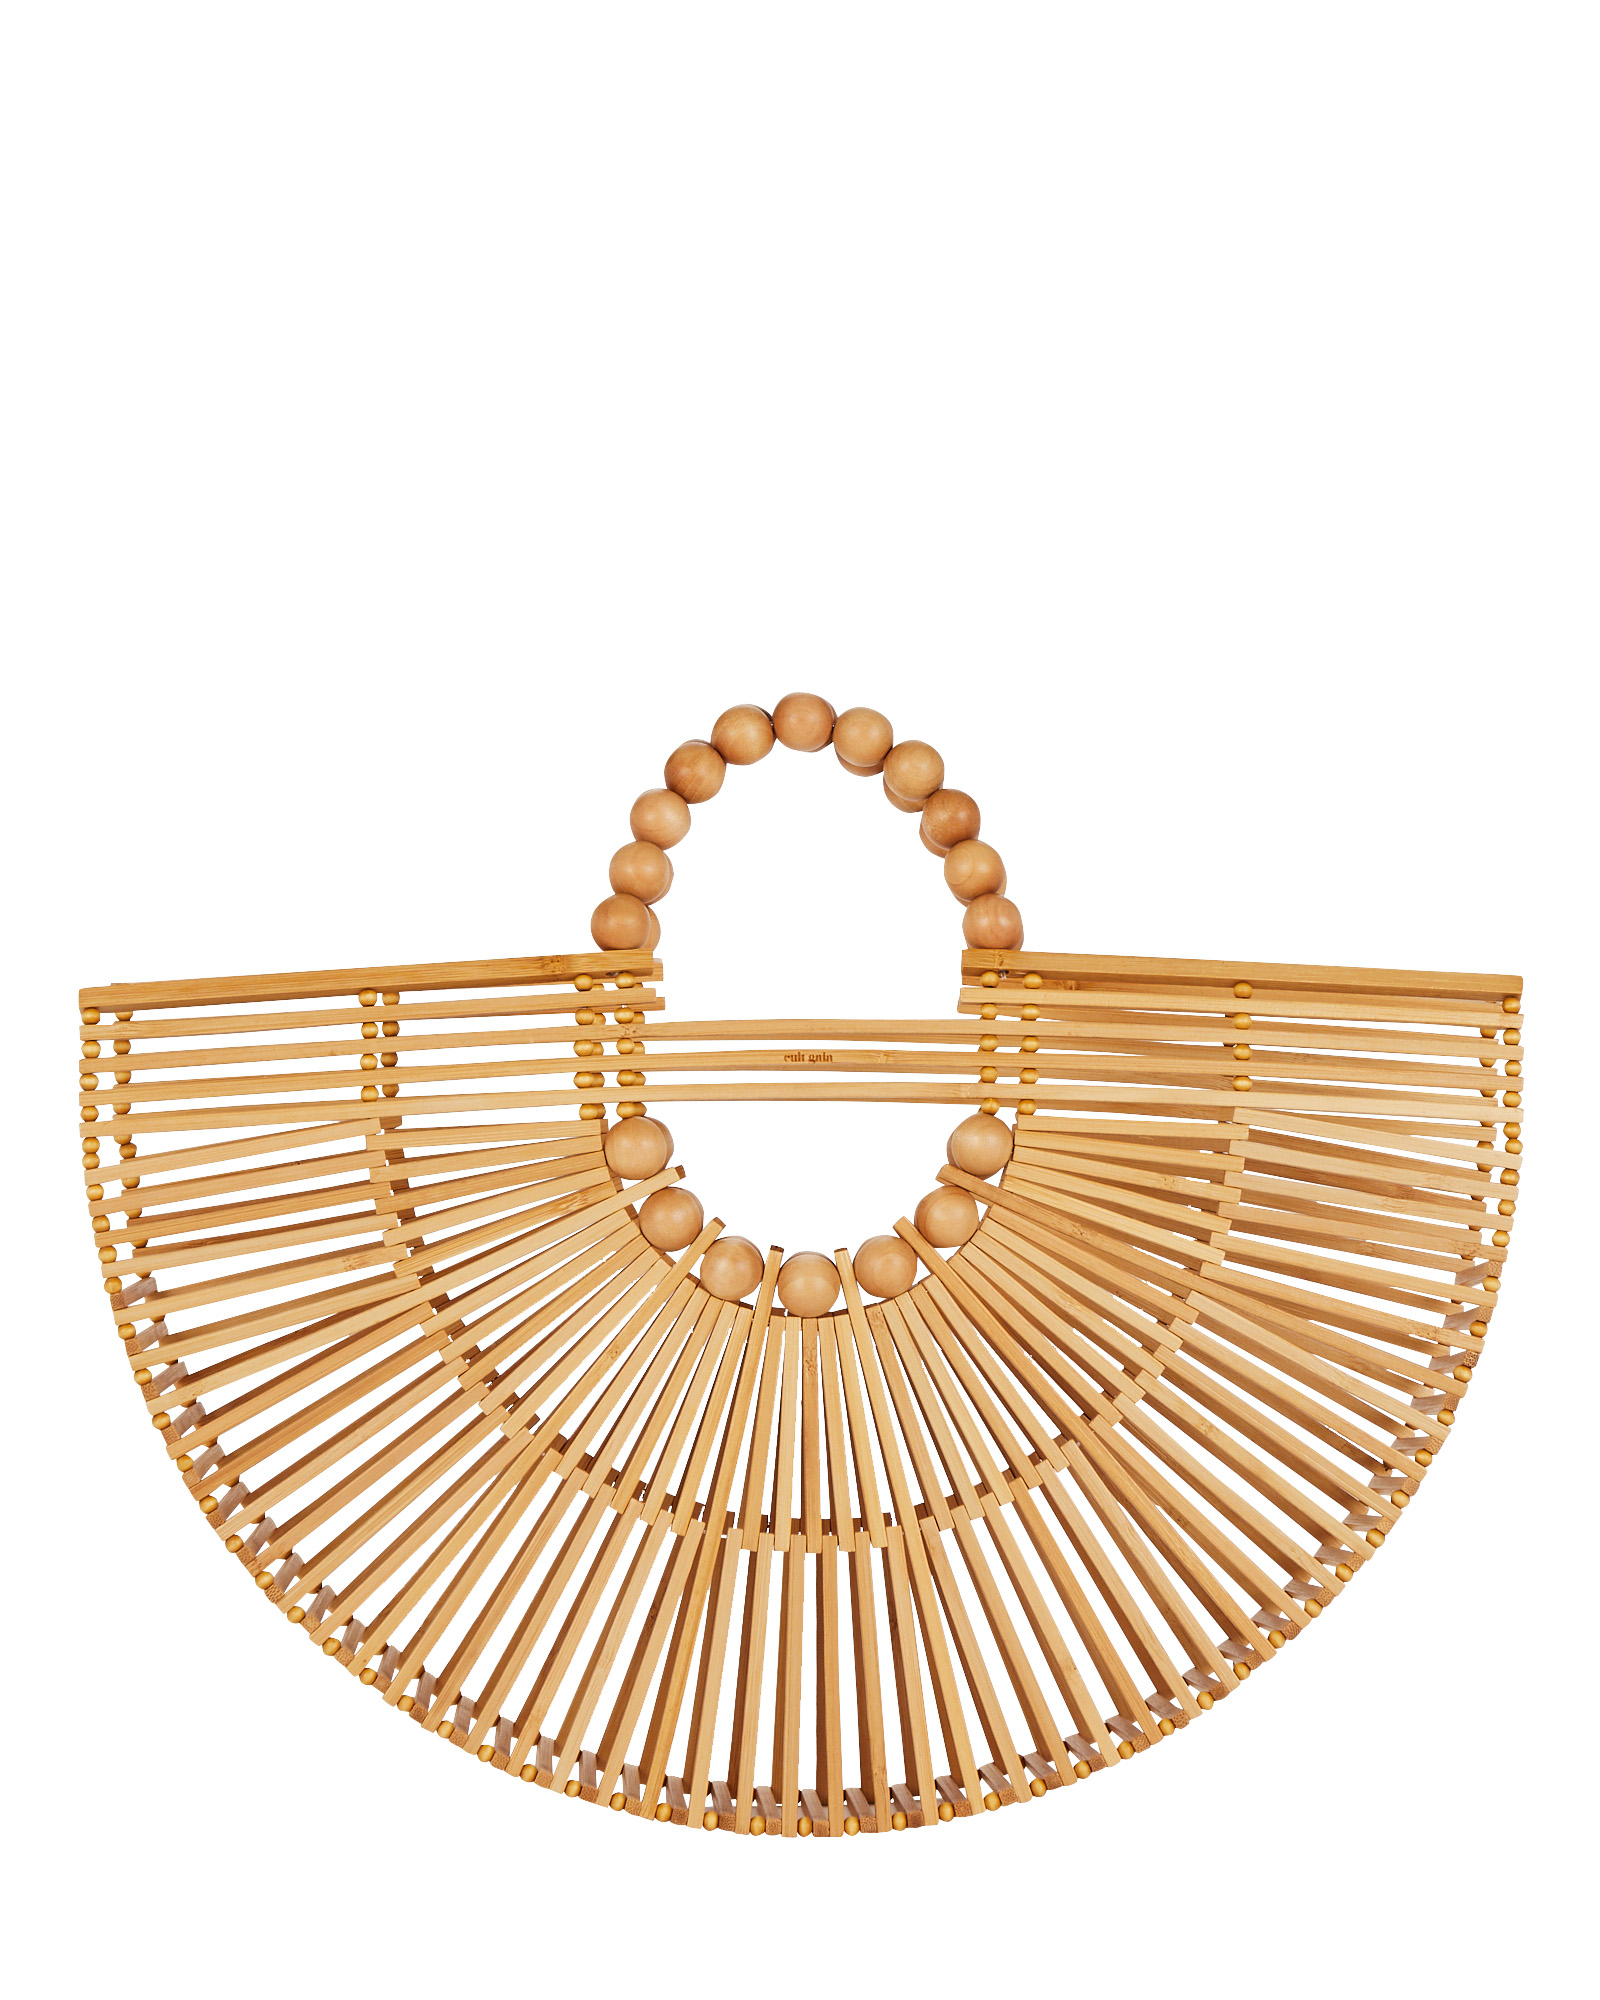 Cult Gaia Handbags Fan Ark Bamboo Tote Bag